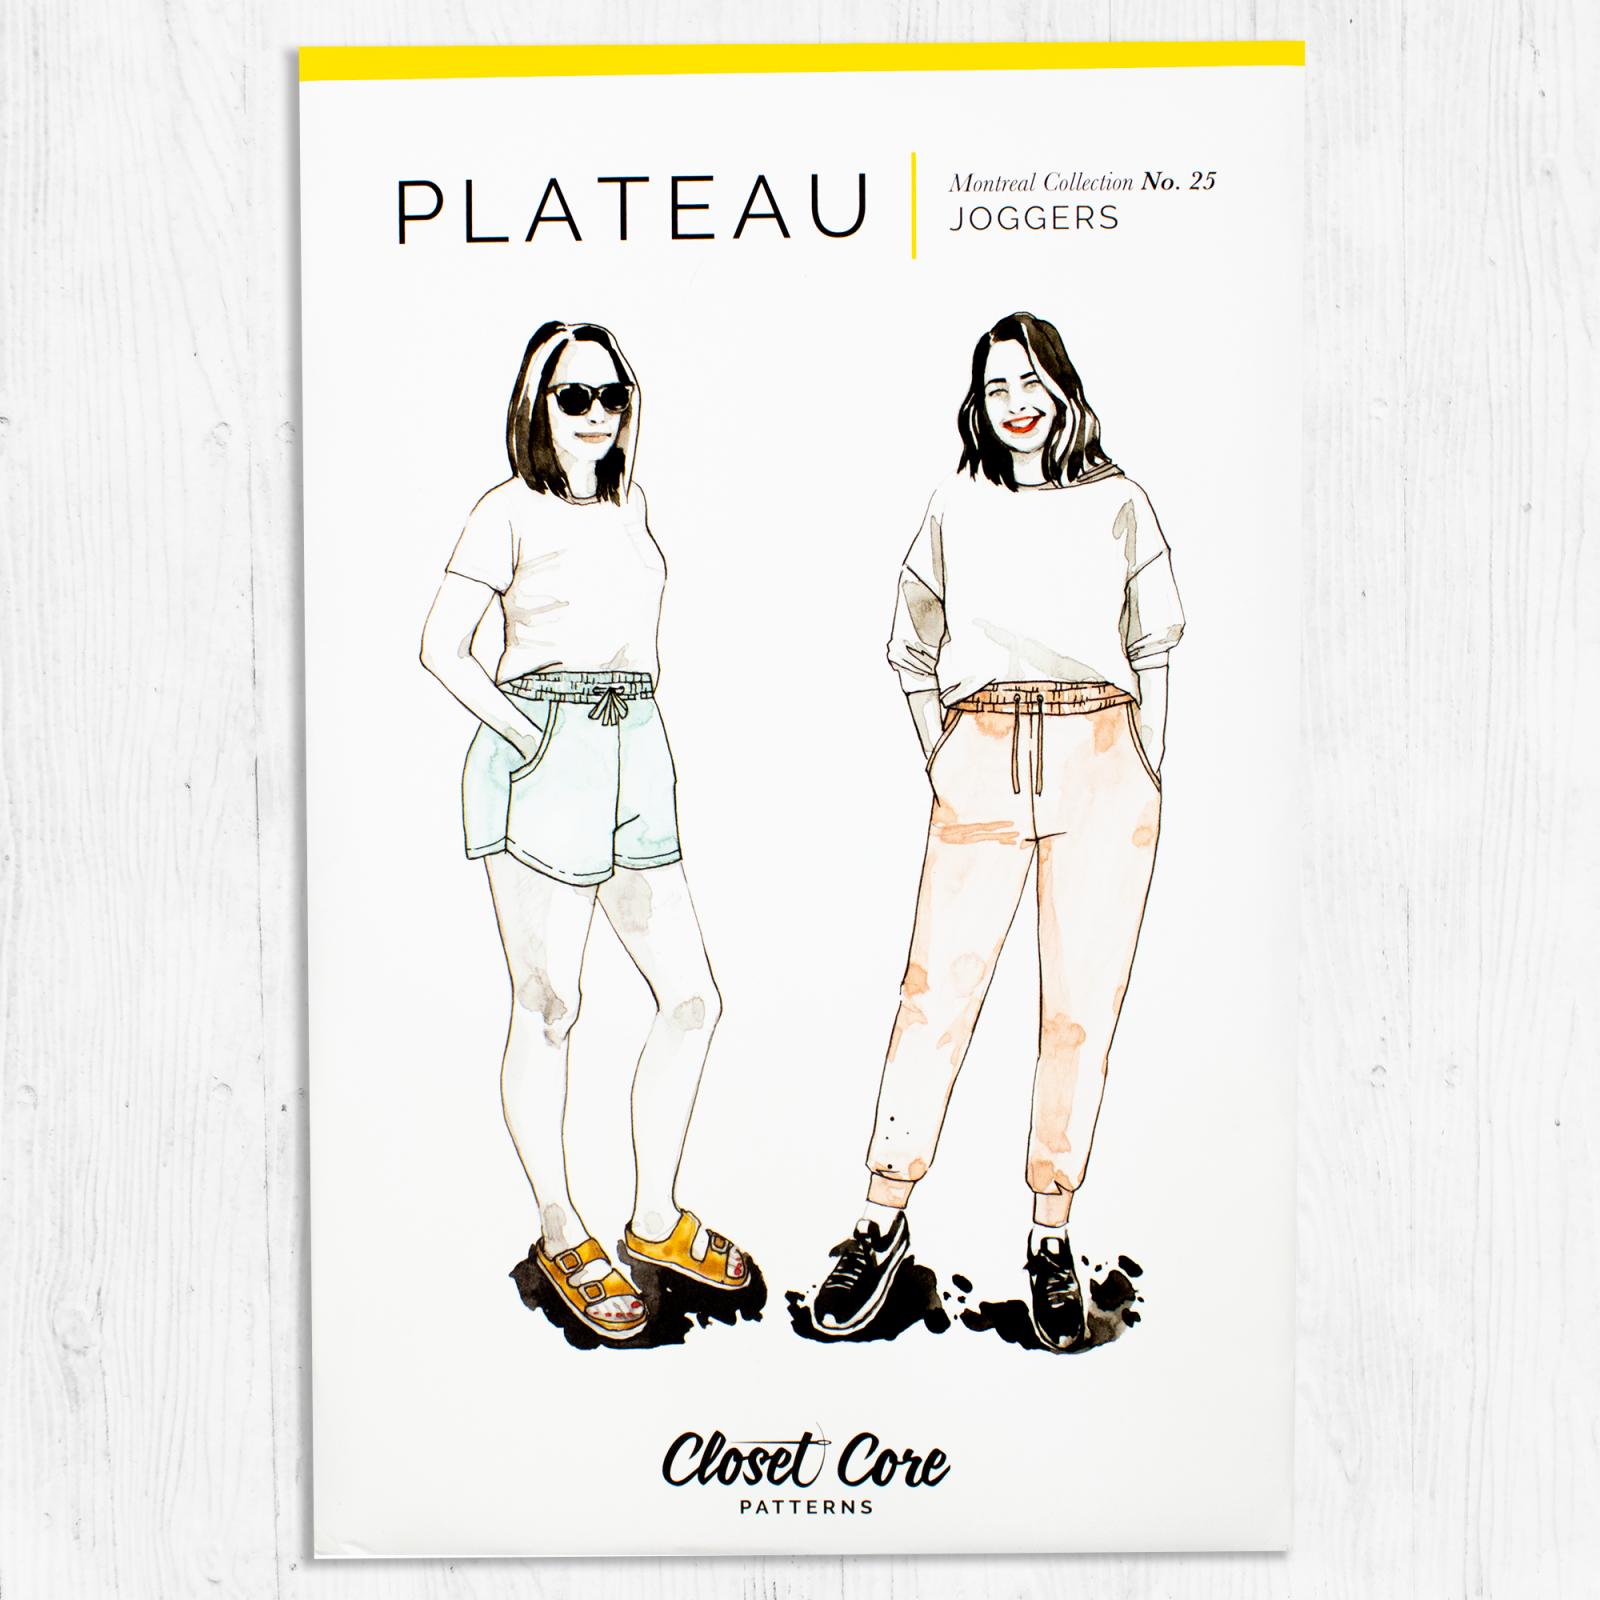 Closet Core Patterns - Plateau Joggers